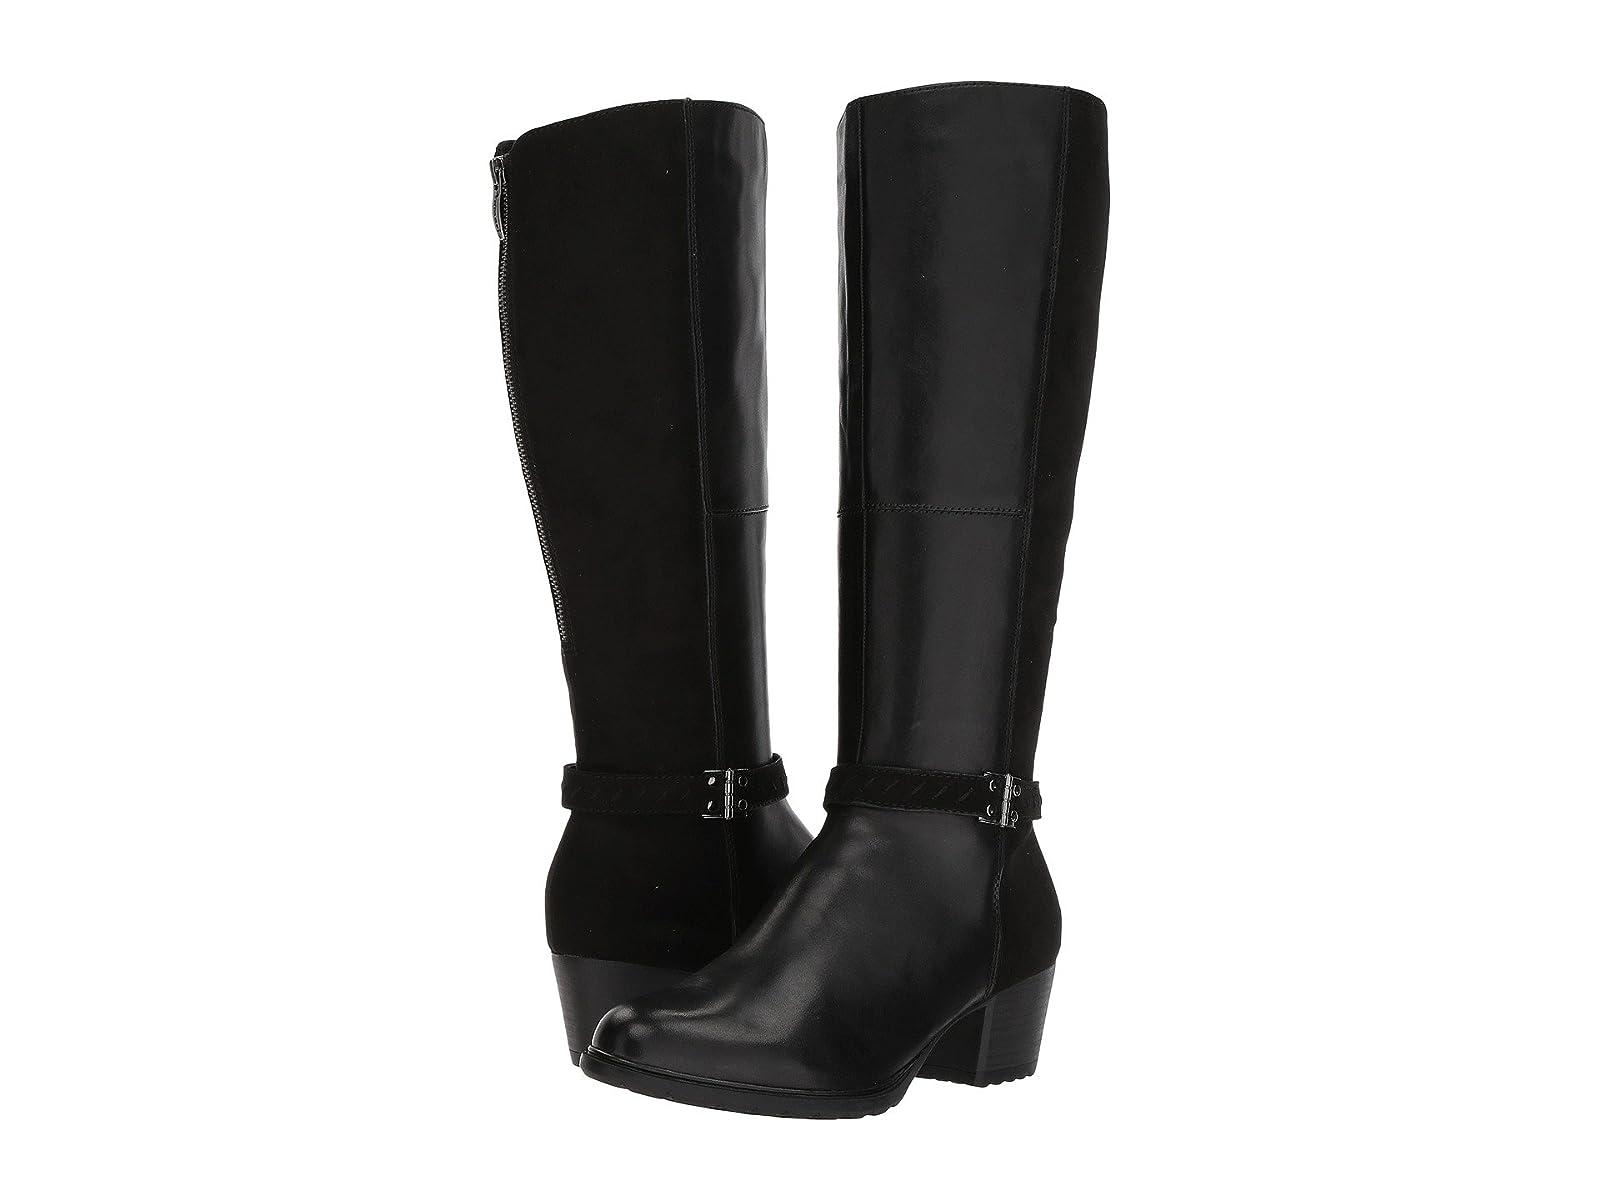 Tamaris Raquel 1-1-25507-29Cheap and distinctive eye-catching shoes